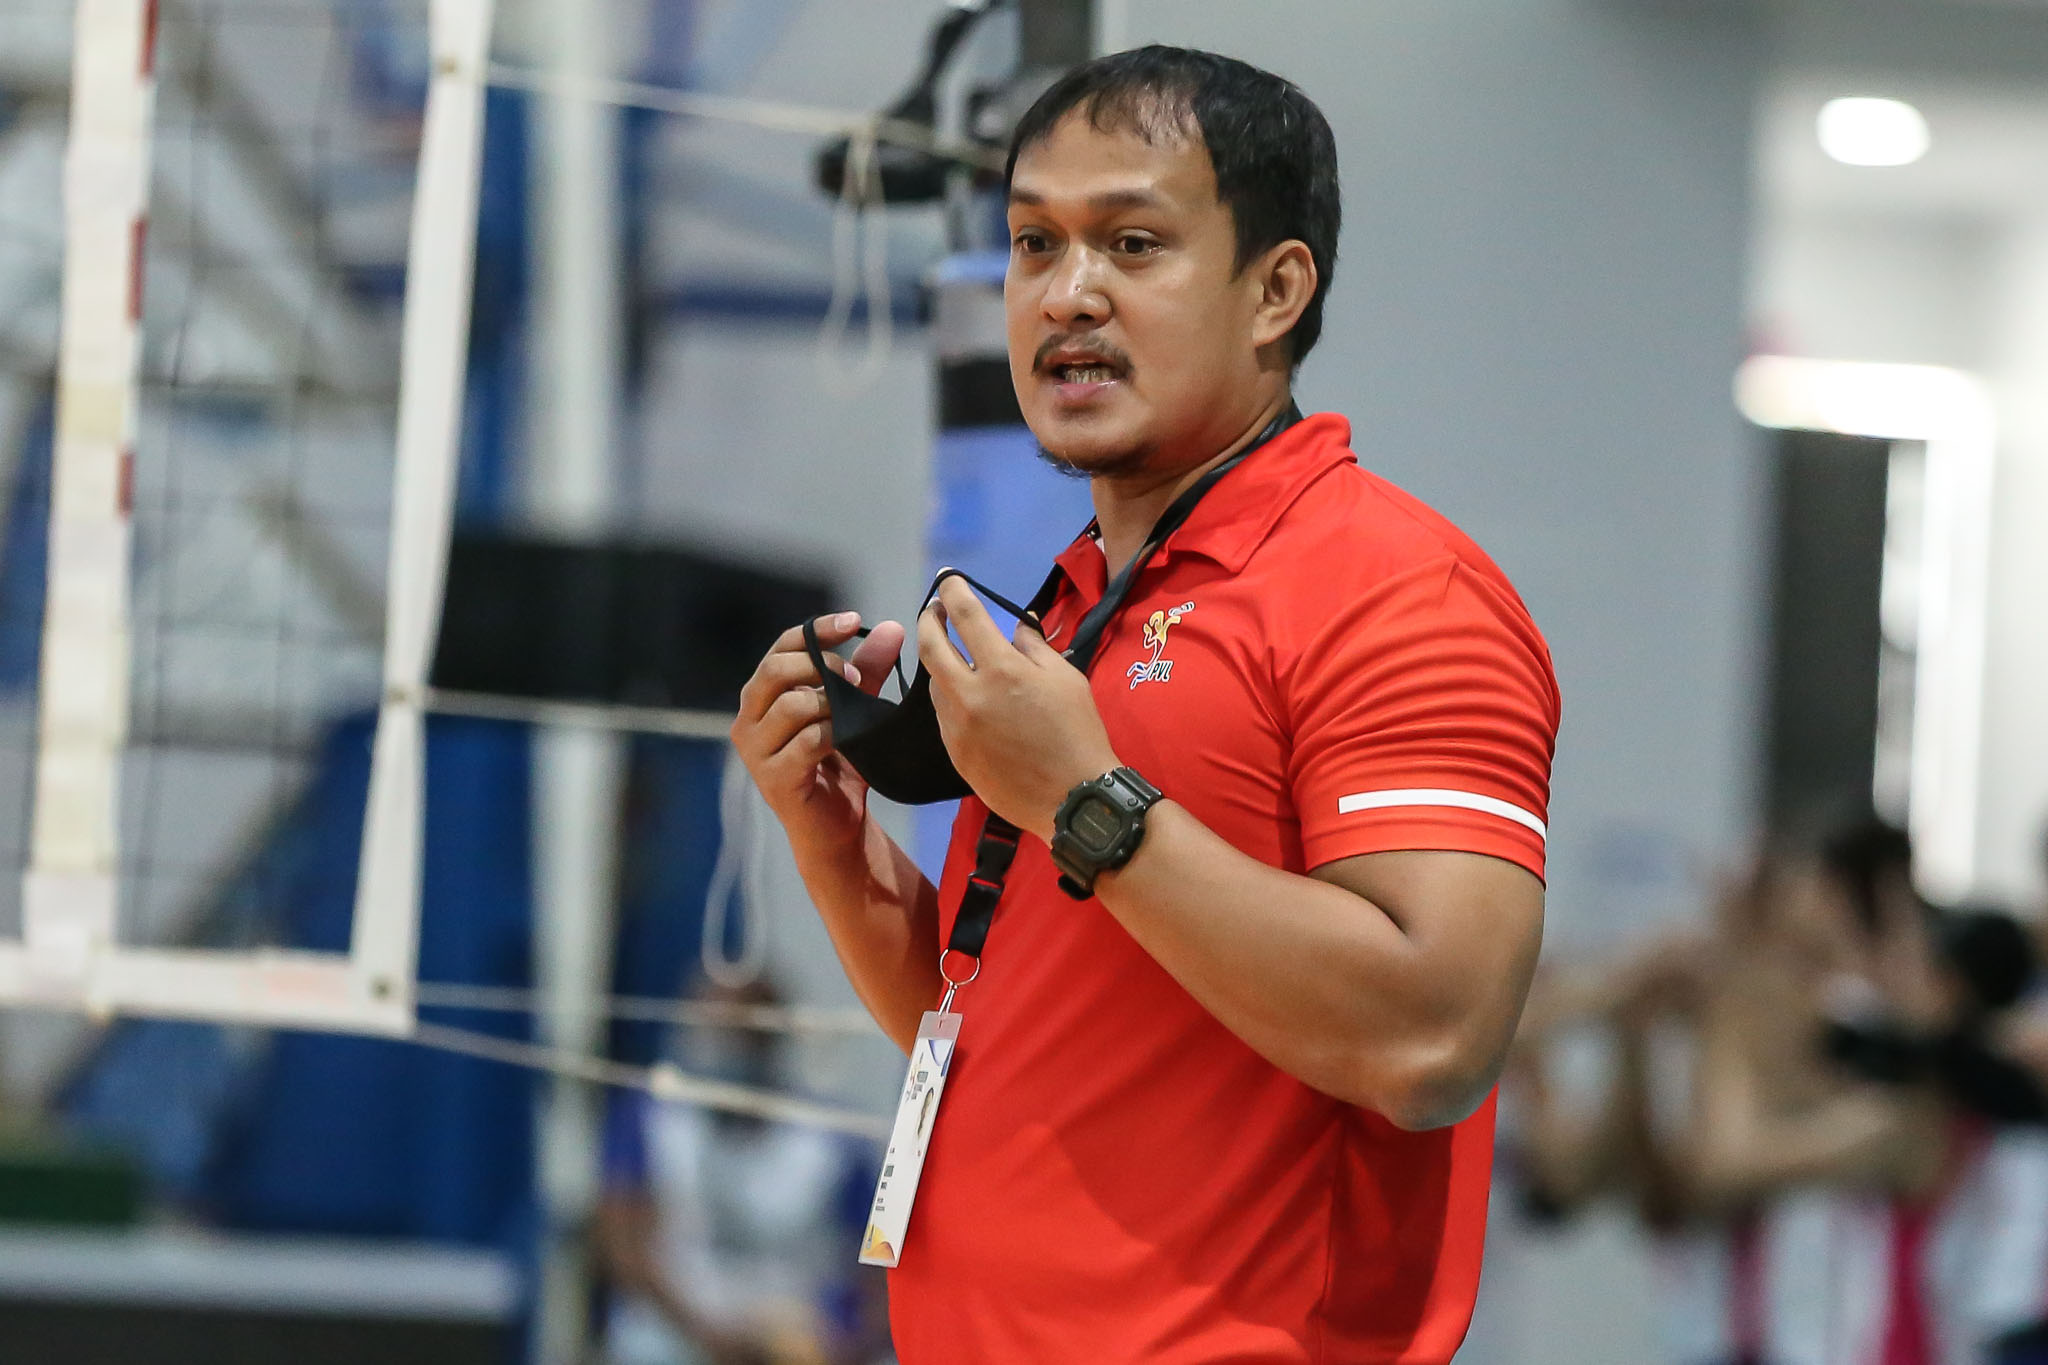 2021-PVL-Open-Creamline-vs-Petro-Gazz-Arnold-Laniog Laniog says Creamline game showed what Petro Gazz needs to work on News PVL Volleyball  - philippine sports news